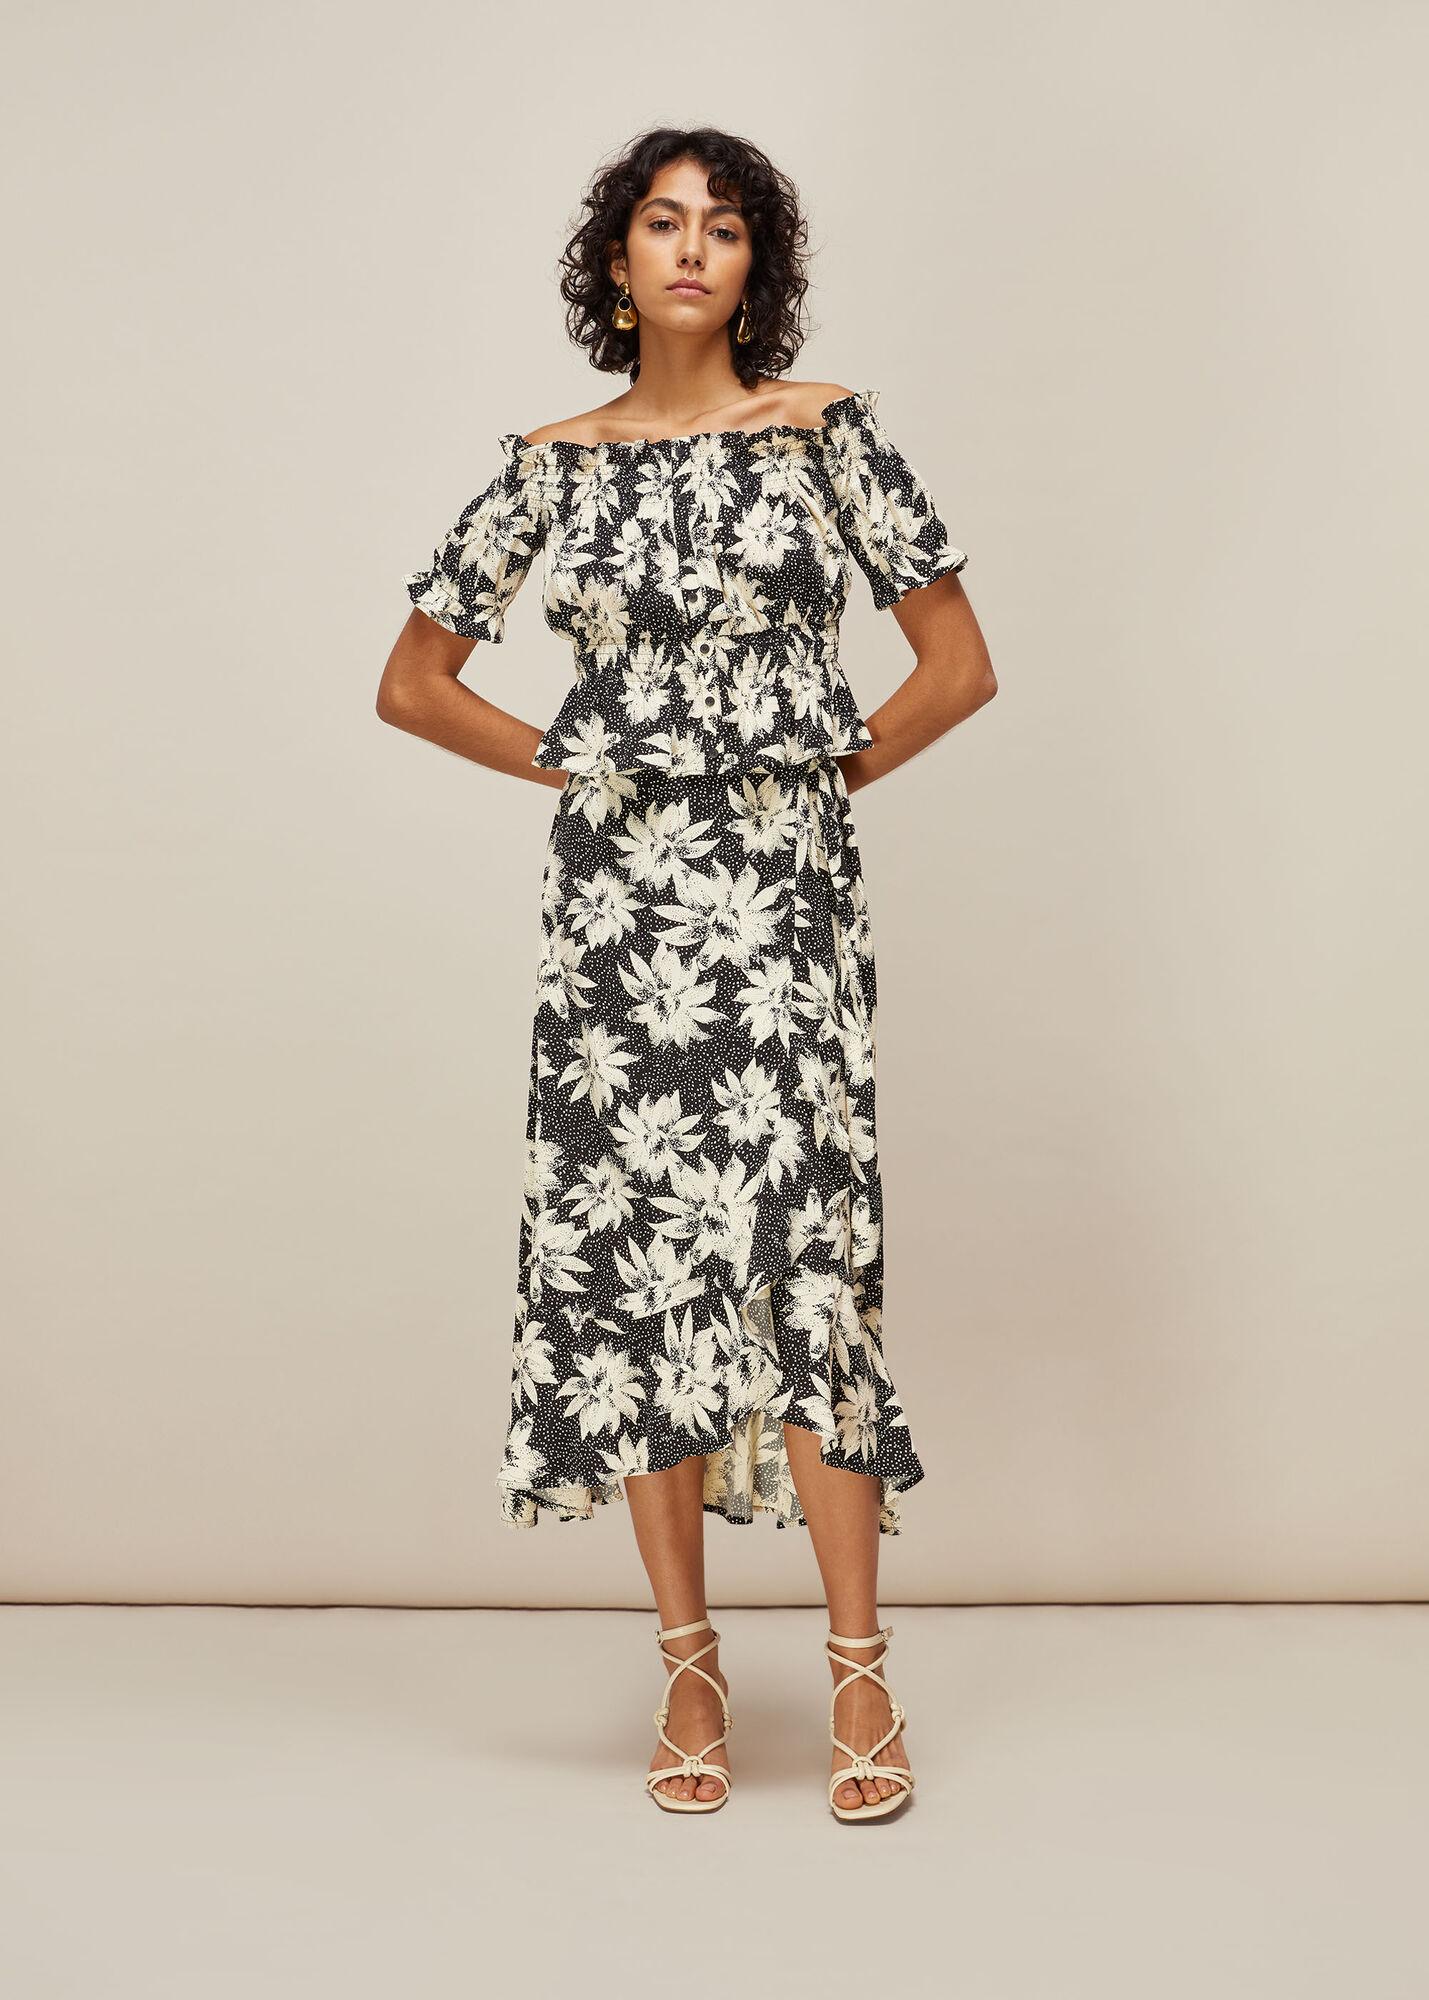 Starburst Floral Wrap Skirt